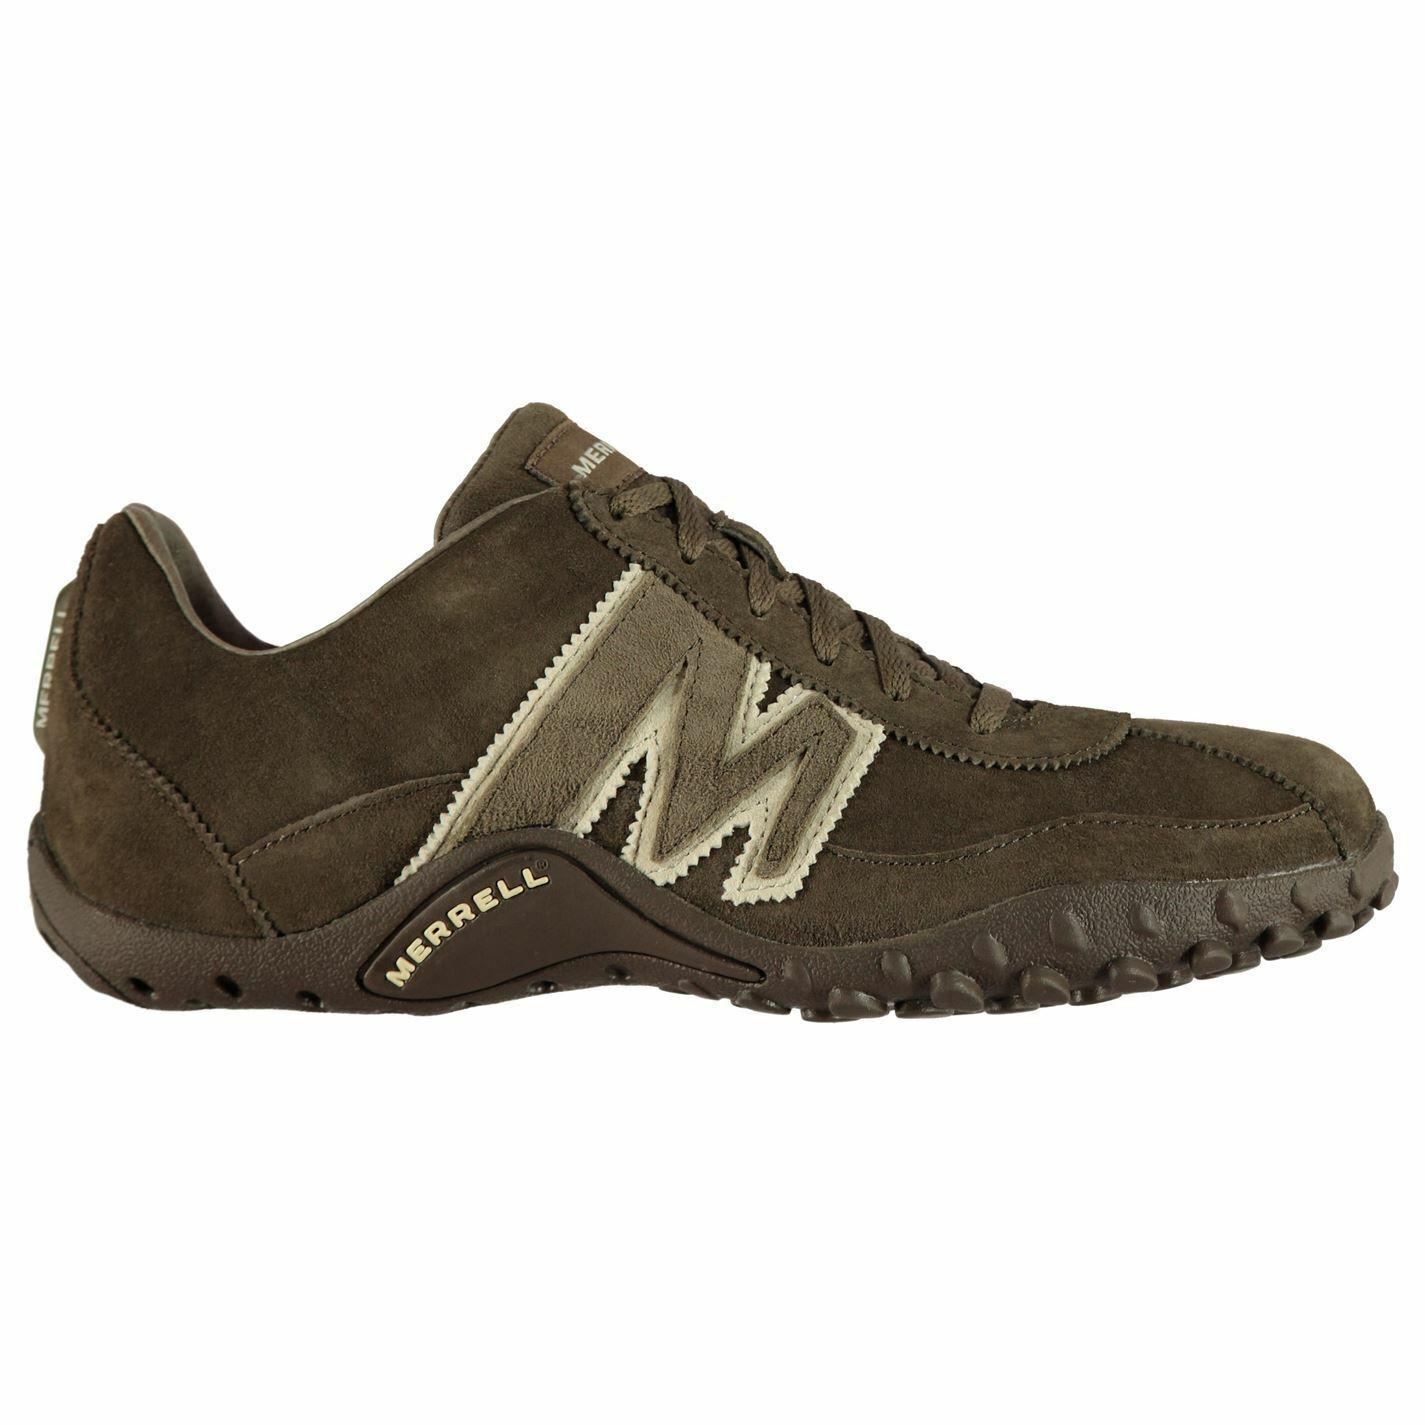 Merrell Sprint Blast Leather Walking schuhe Mens braun Hiking Footwear Stiefel